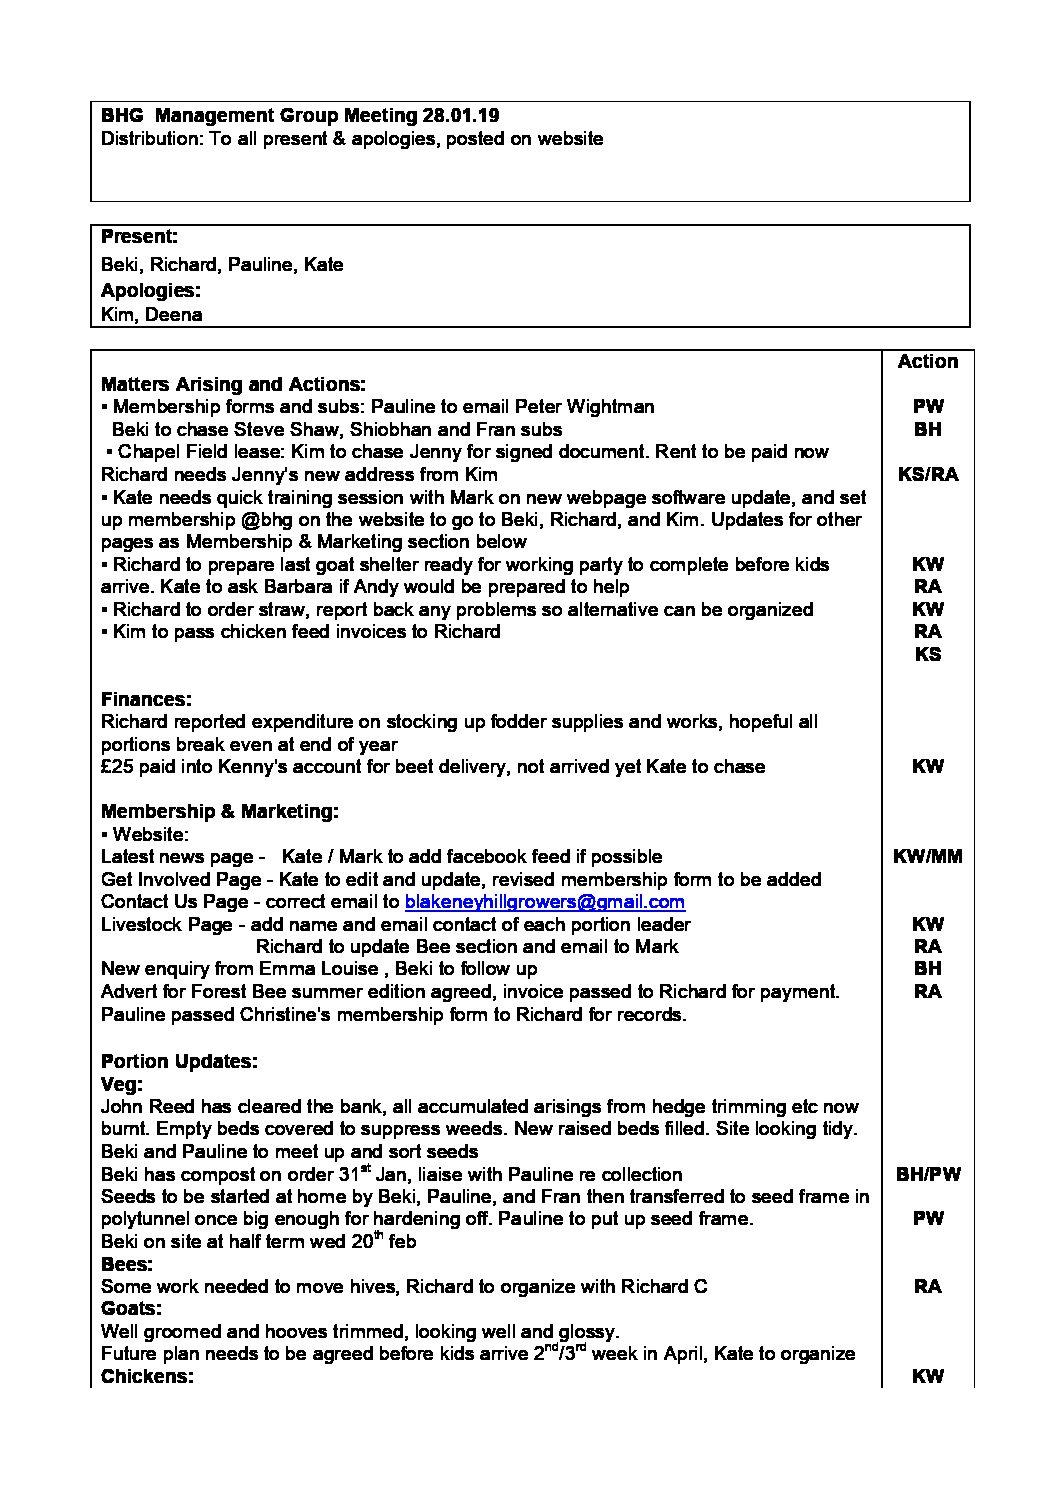 BHG-Minutes-28.01.19-pdf